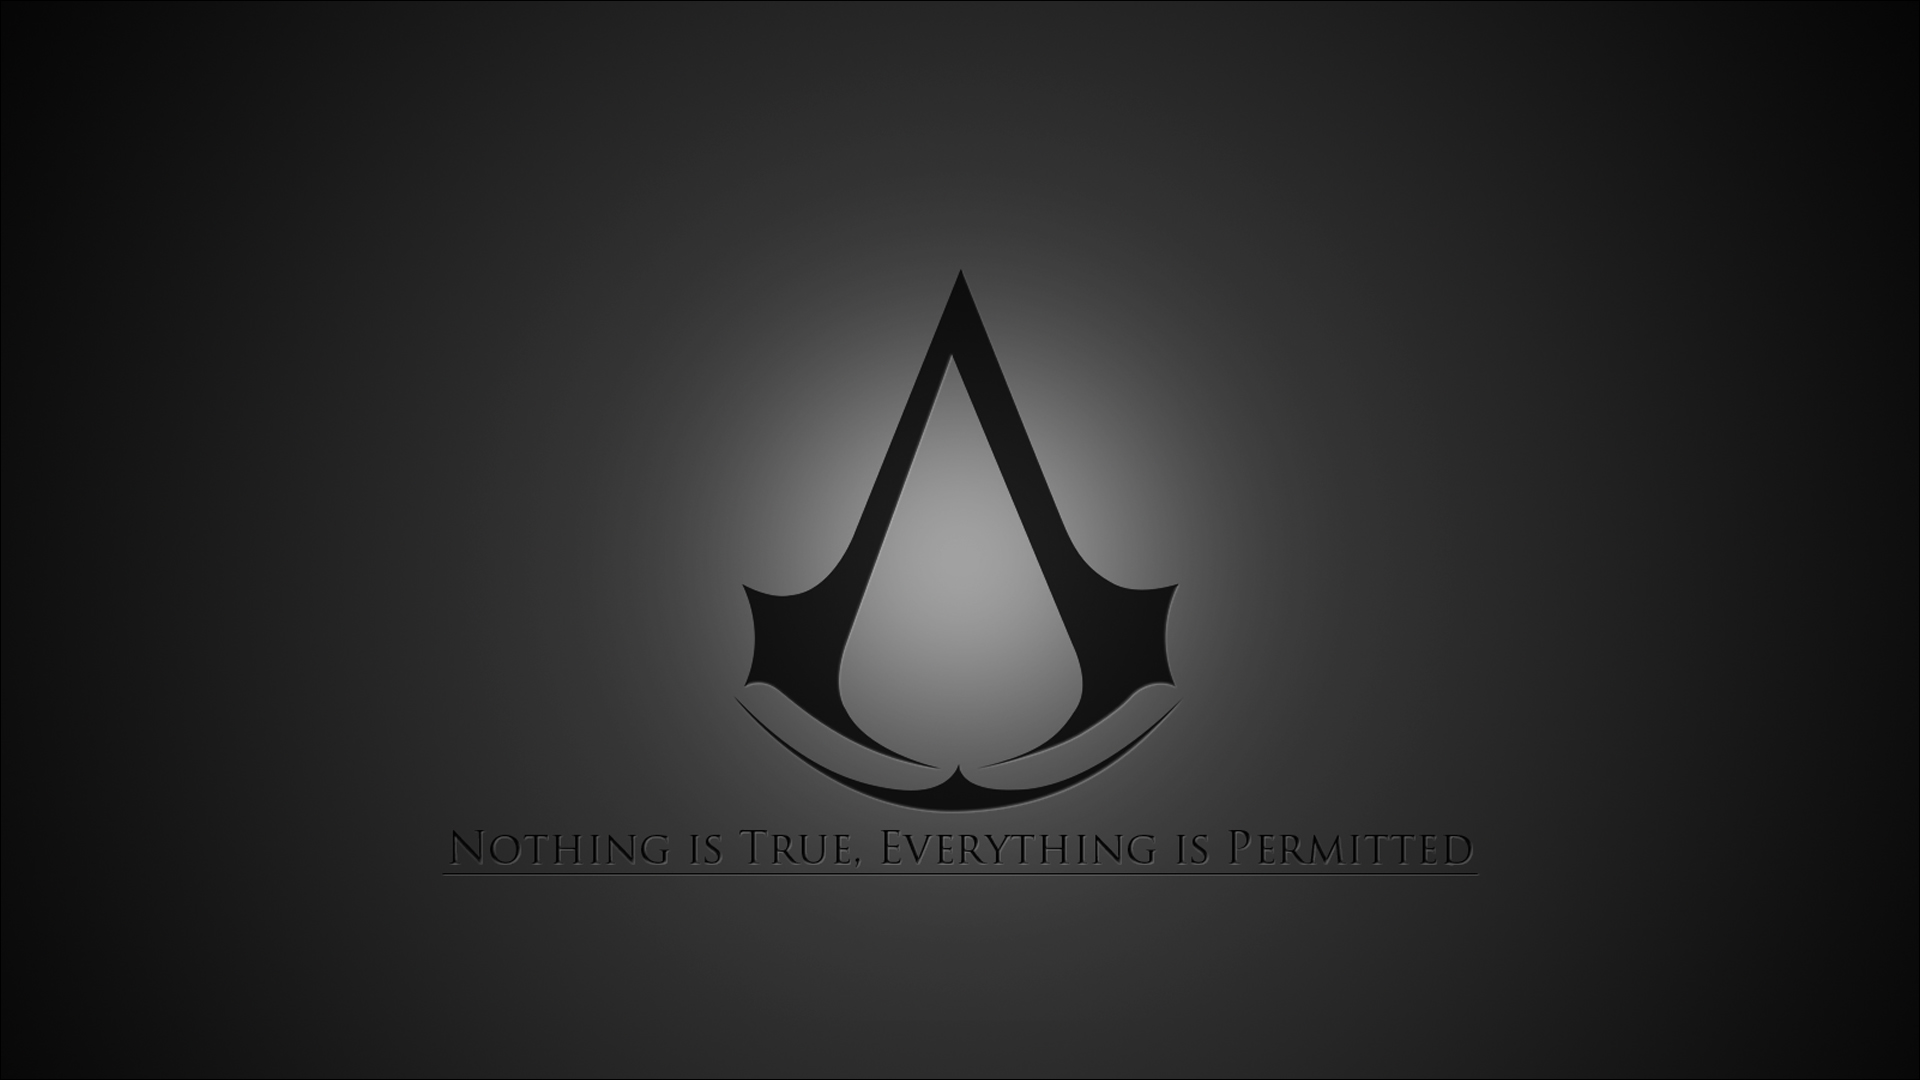 The Assassins Creed motto wallpaper   690975 1920x1080